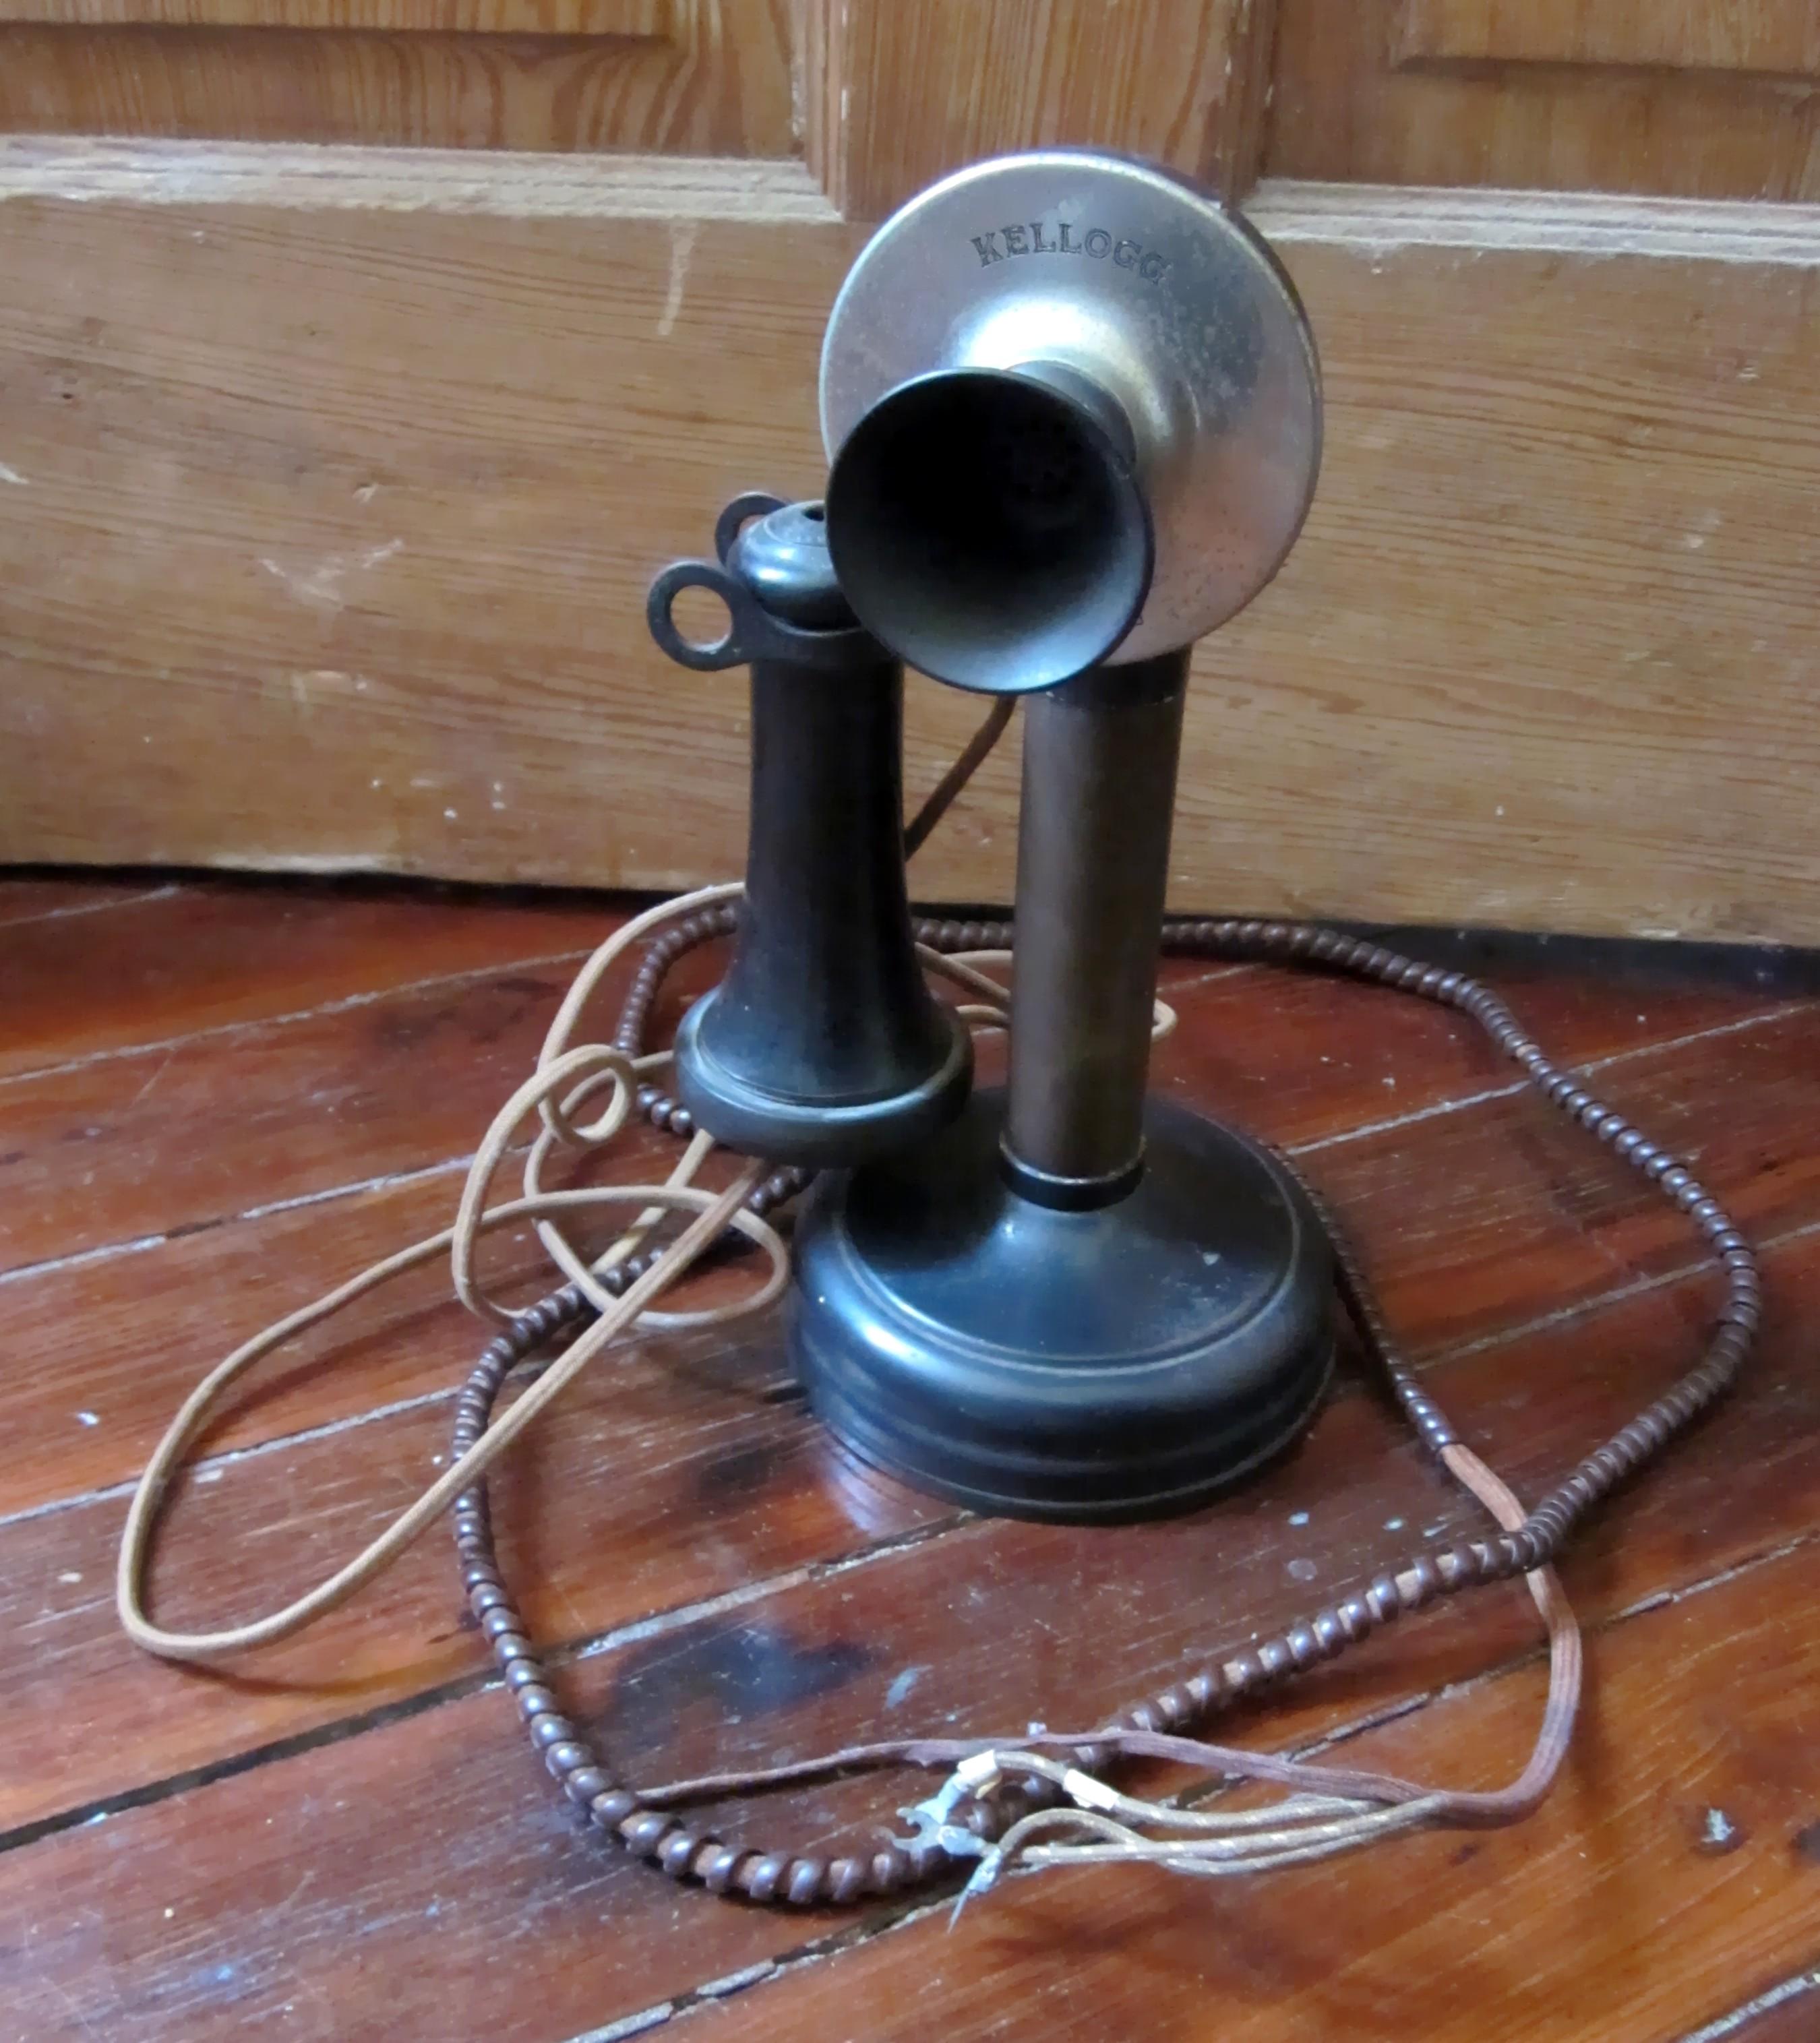 Kellogg_Candlestick_Telephone